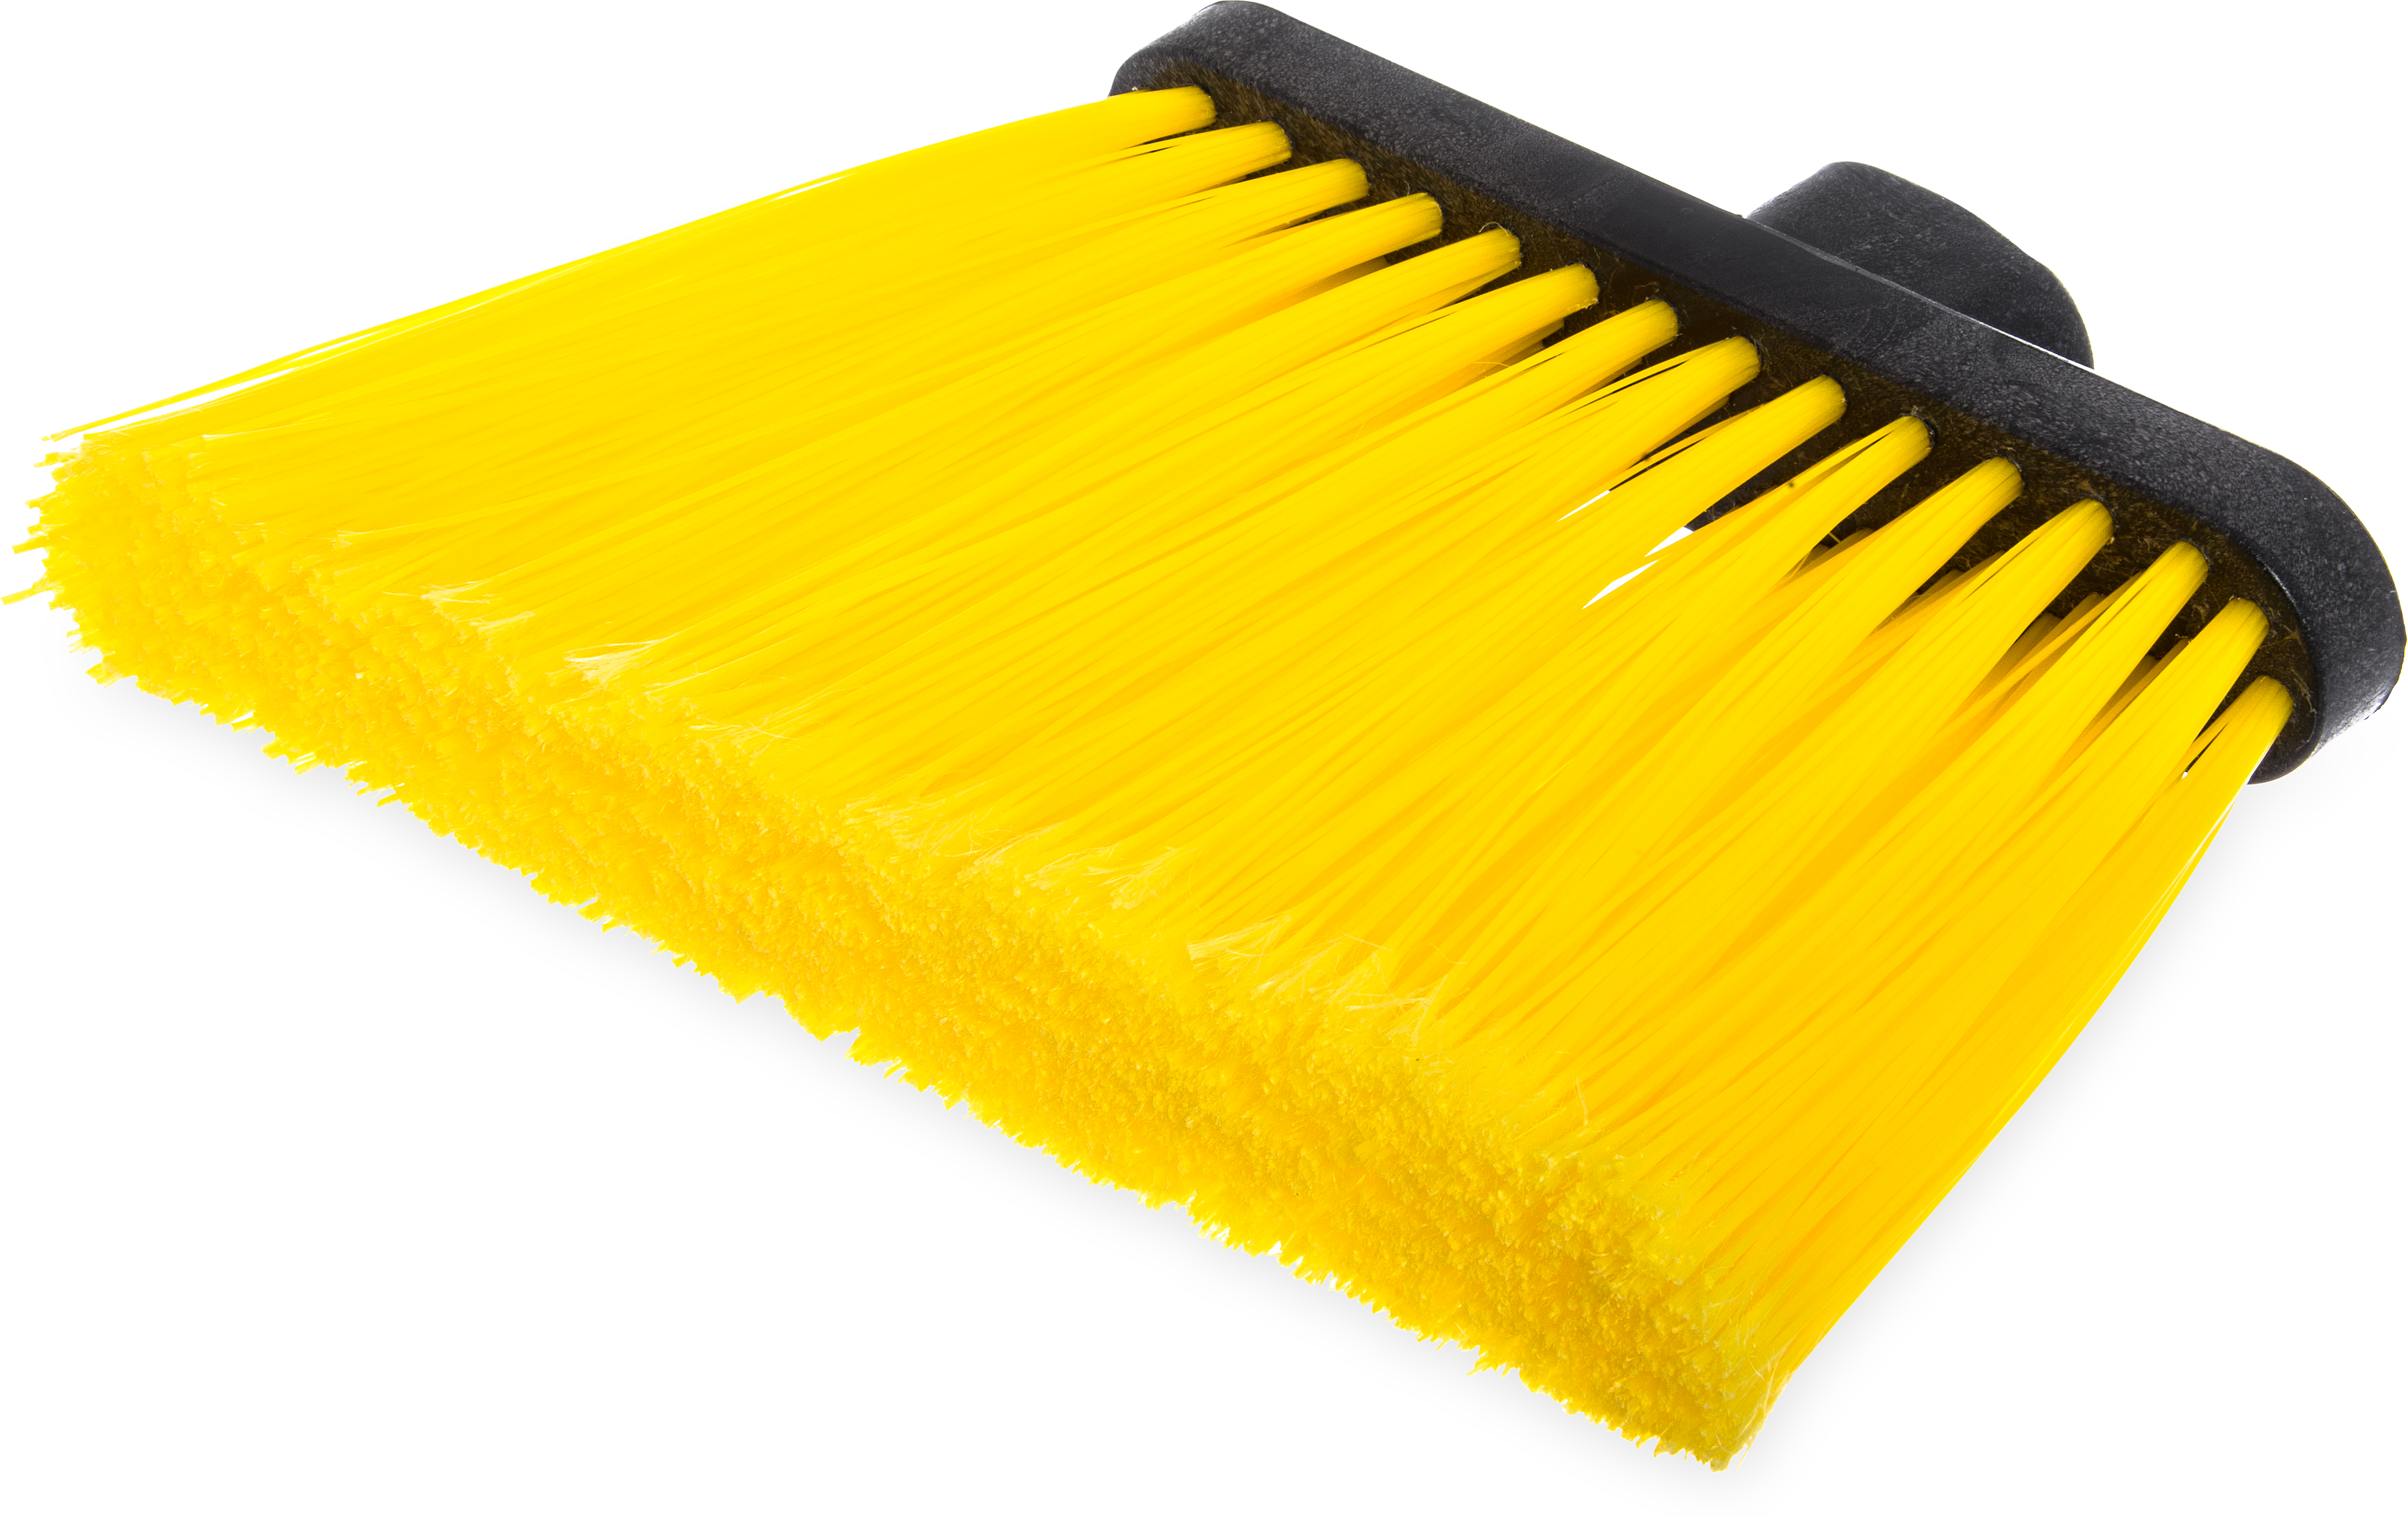 Carlisle 3686704 duo-sweep angle brooms